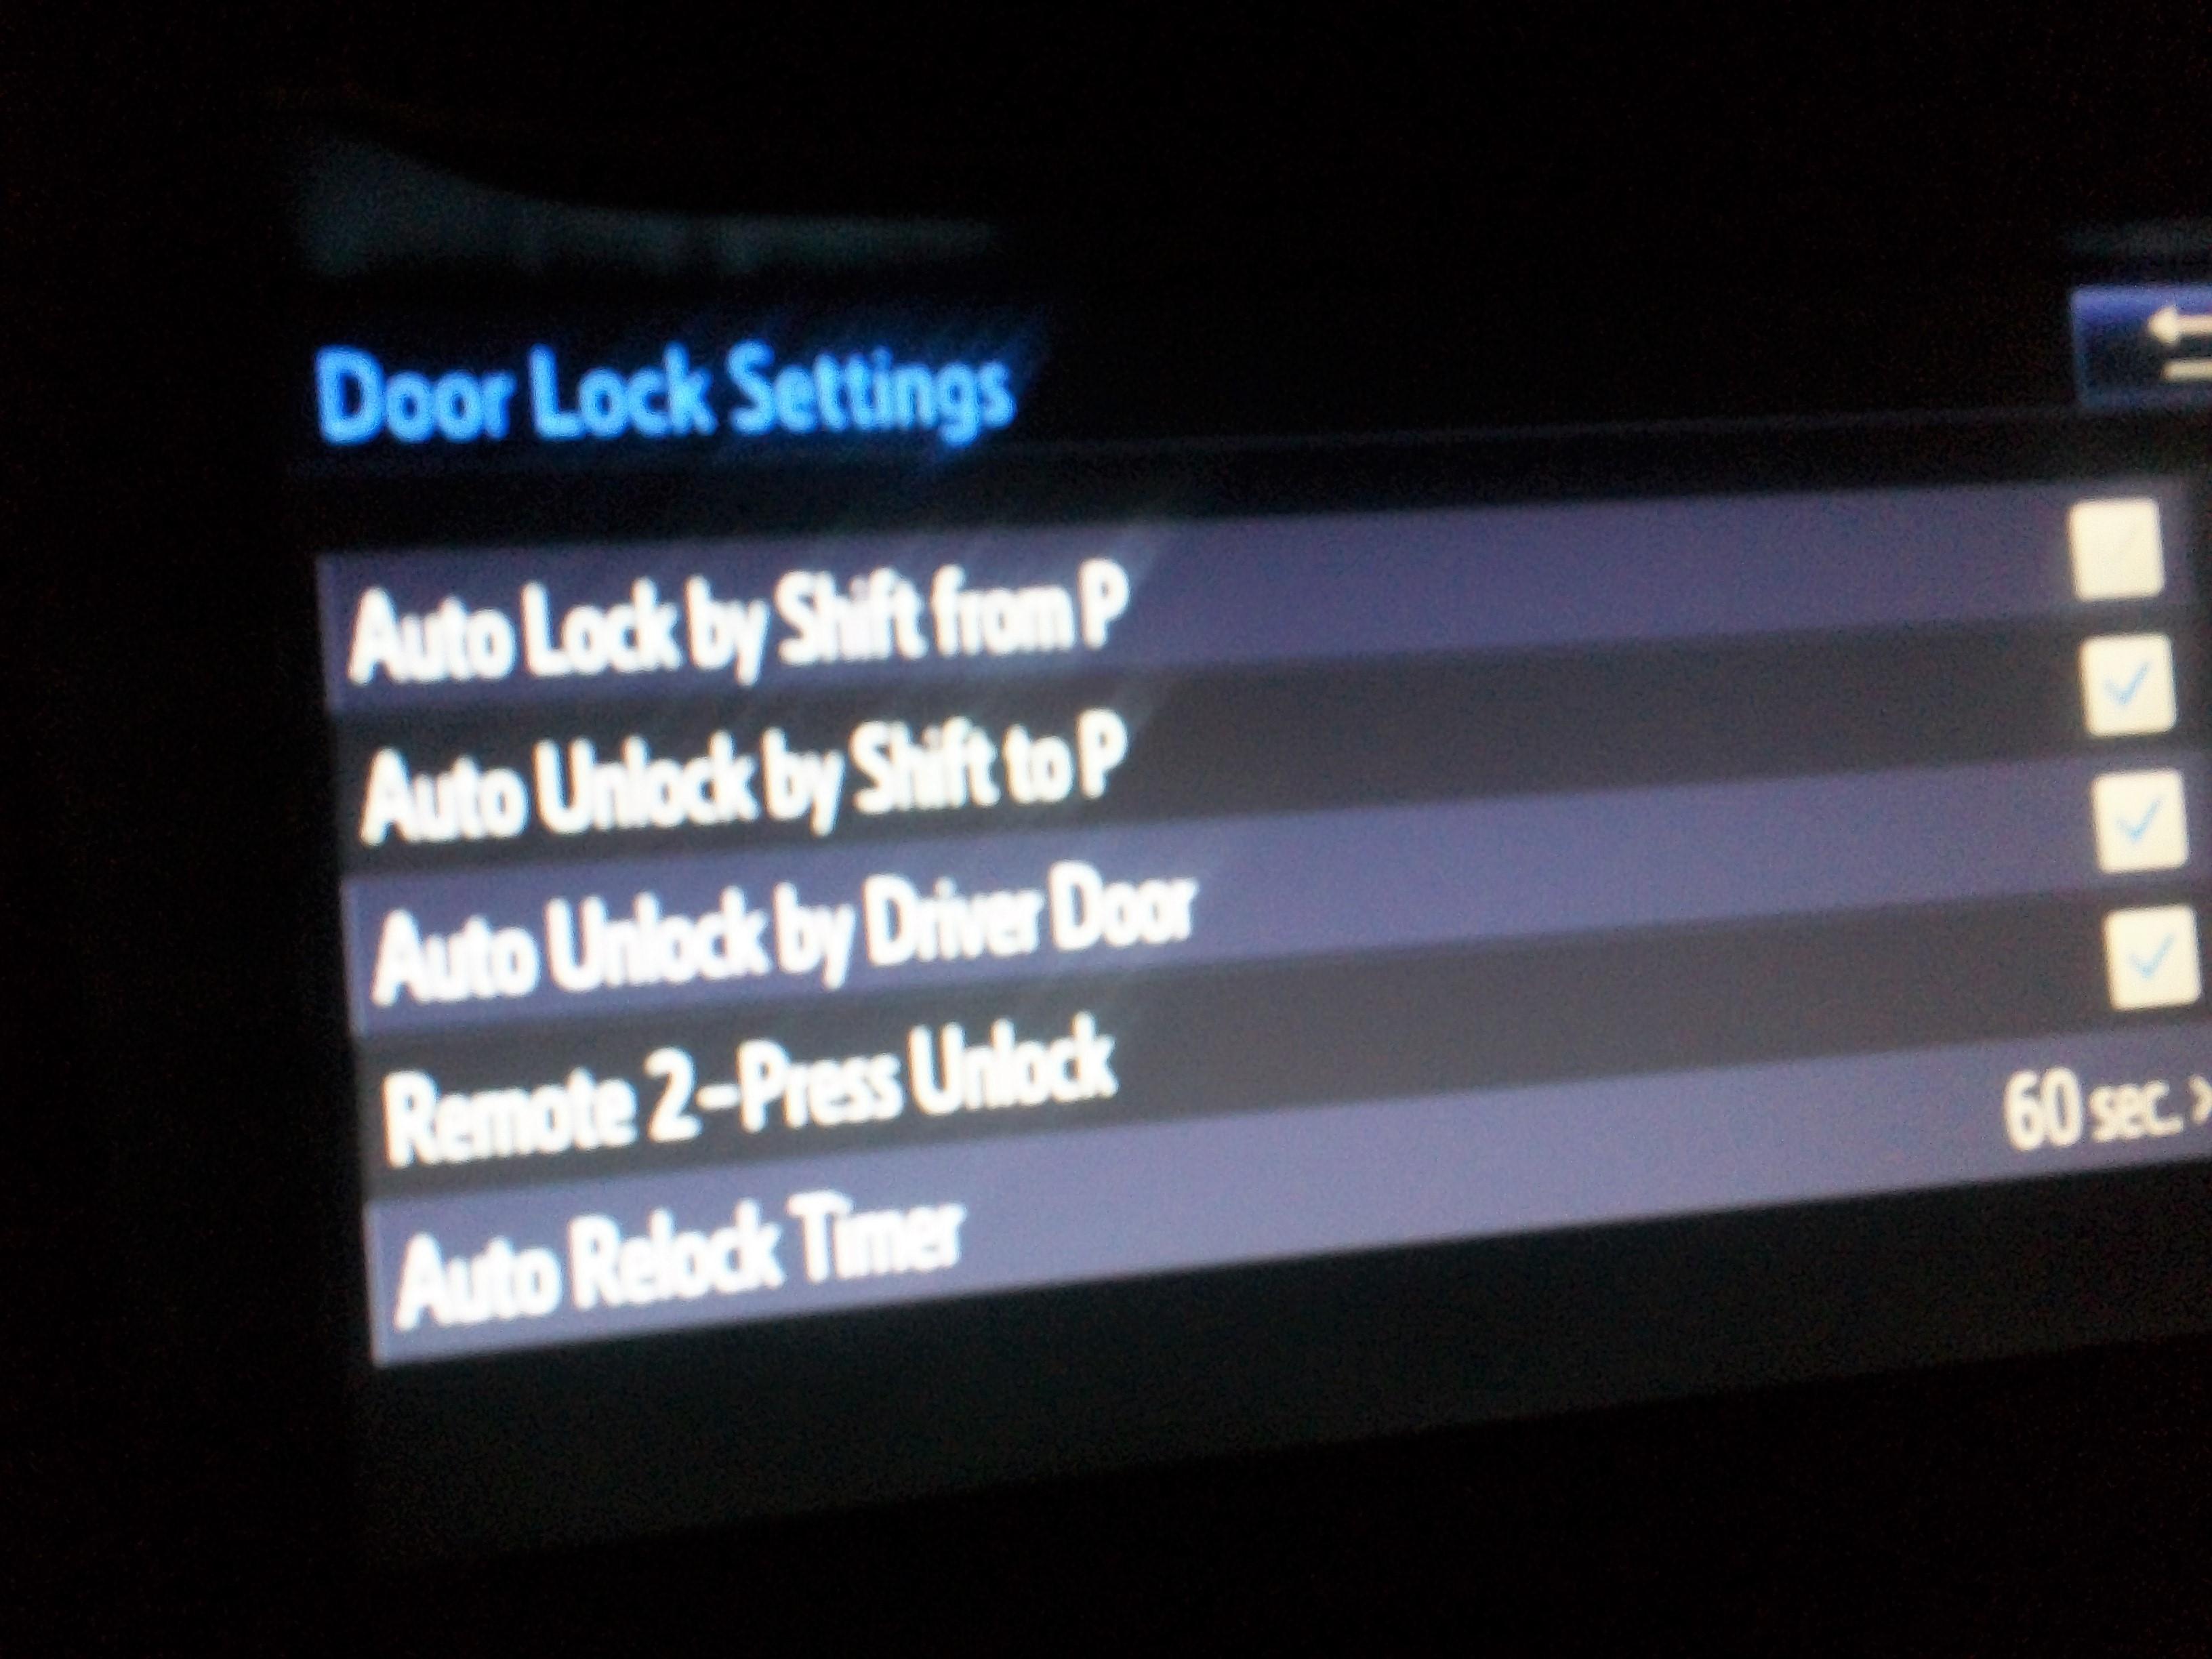 2017 Le Display Settings Auto Unlock Toyota Nation Forum